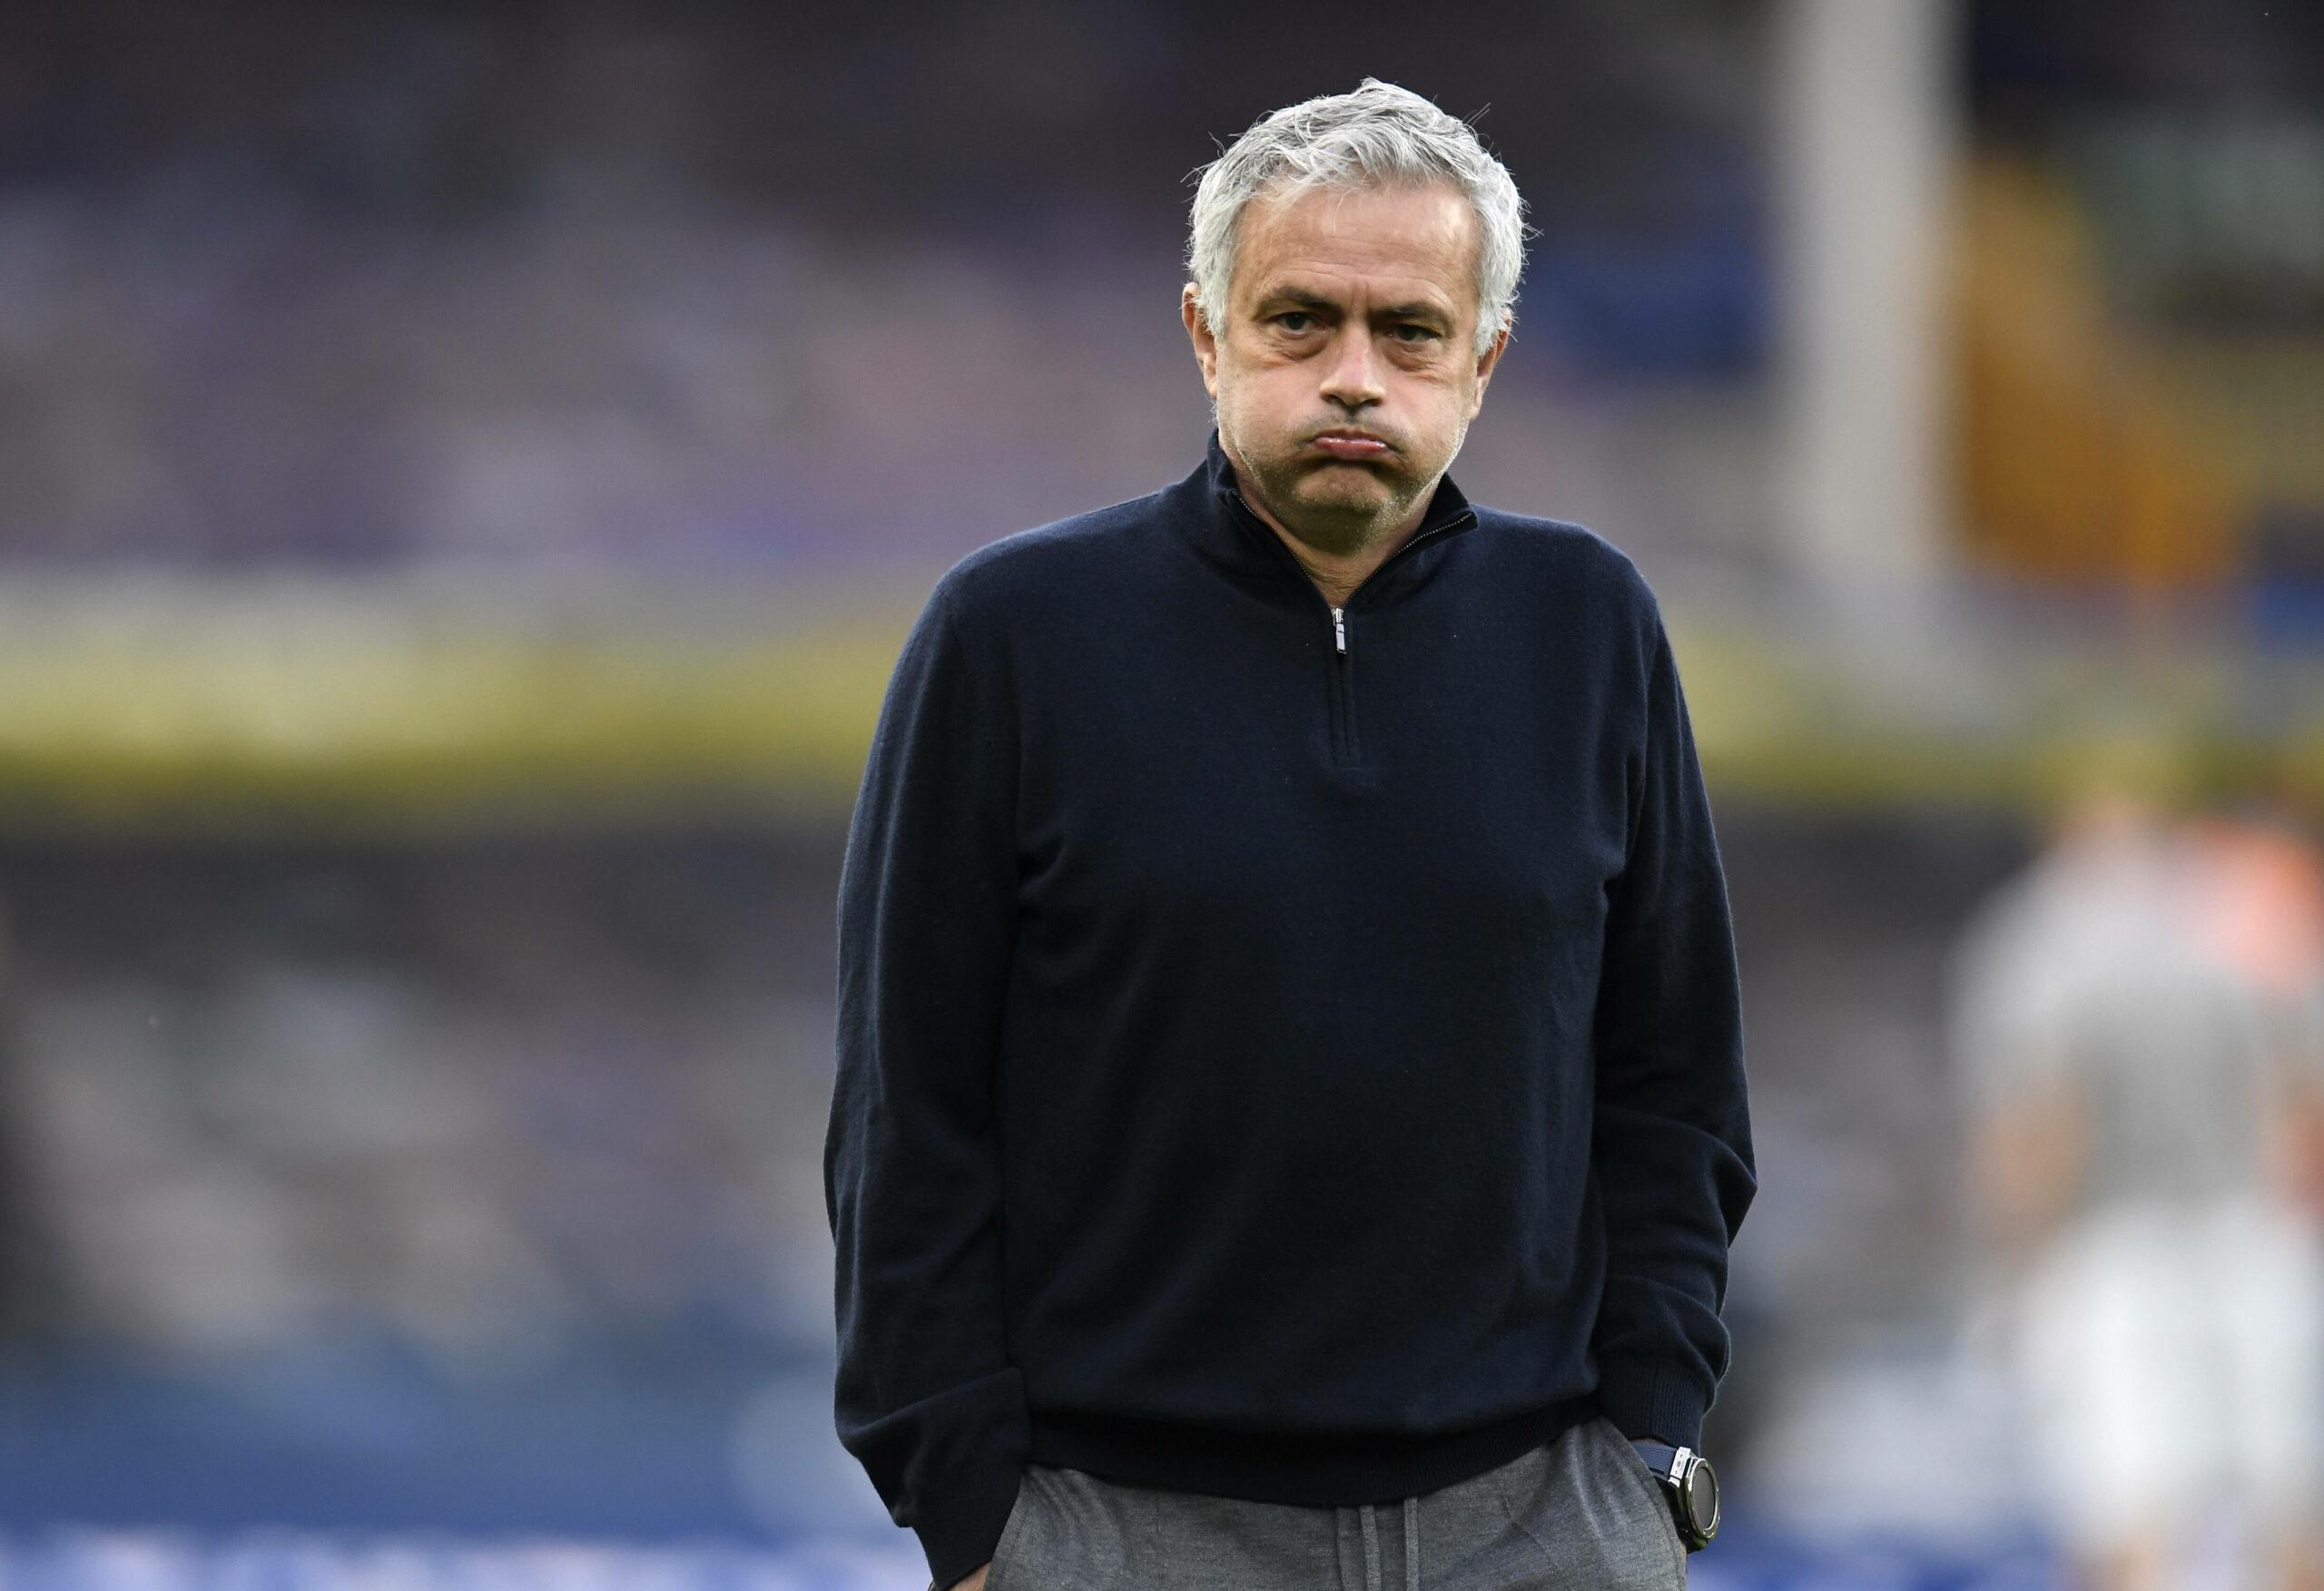 Jose Mourinho (Tottenham) gegen Everton